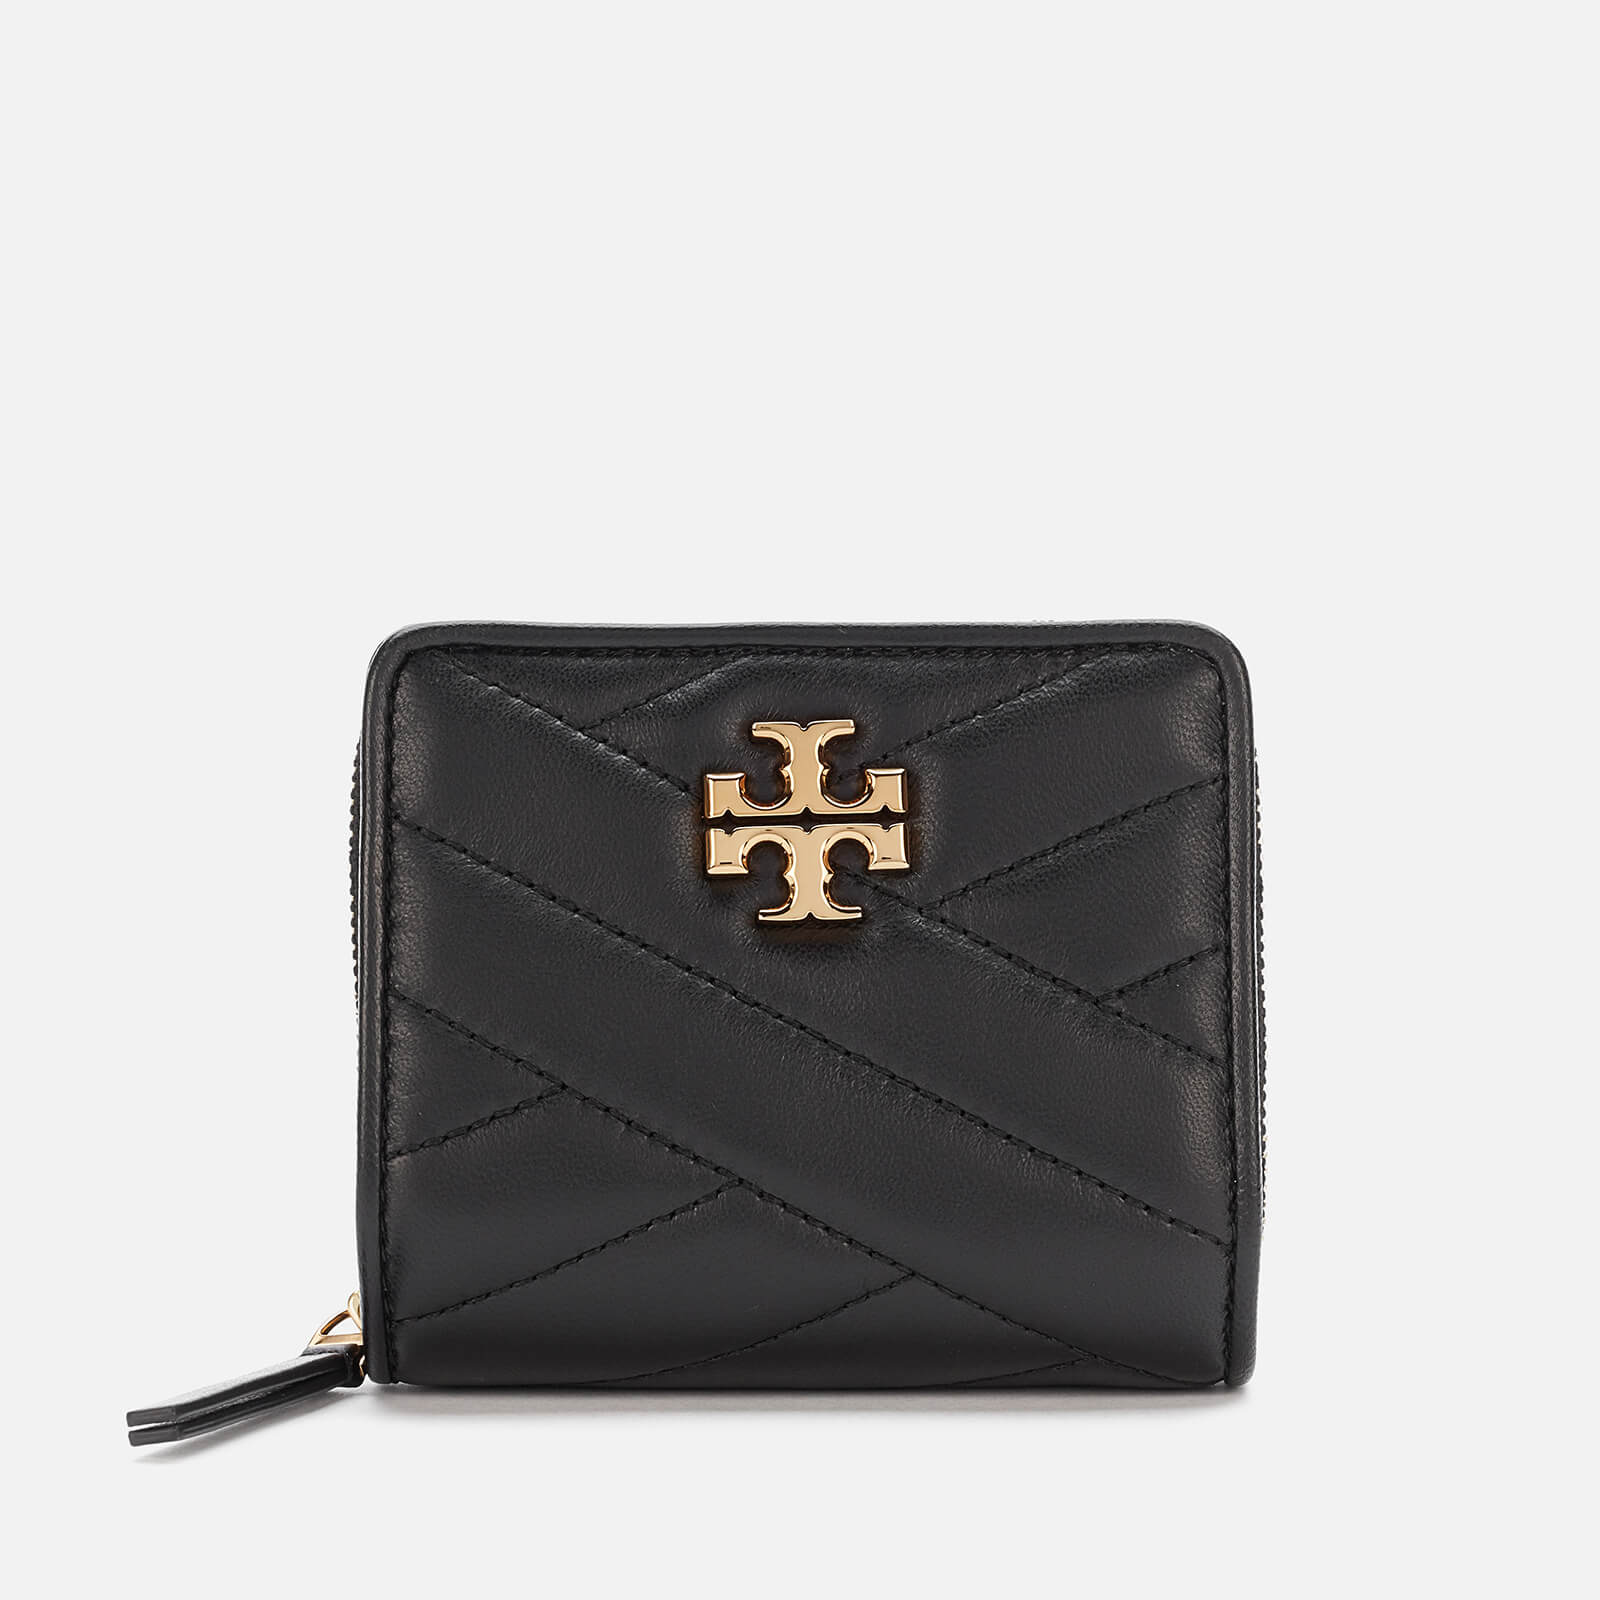 Tory Burch Women's Kira Chevron Bi-Fold Wallet - Black